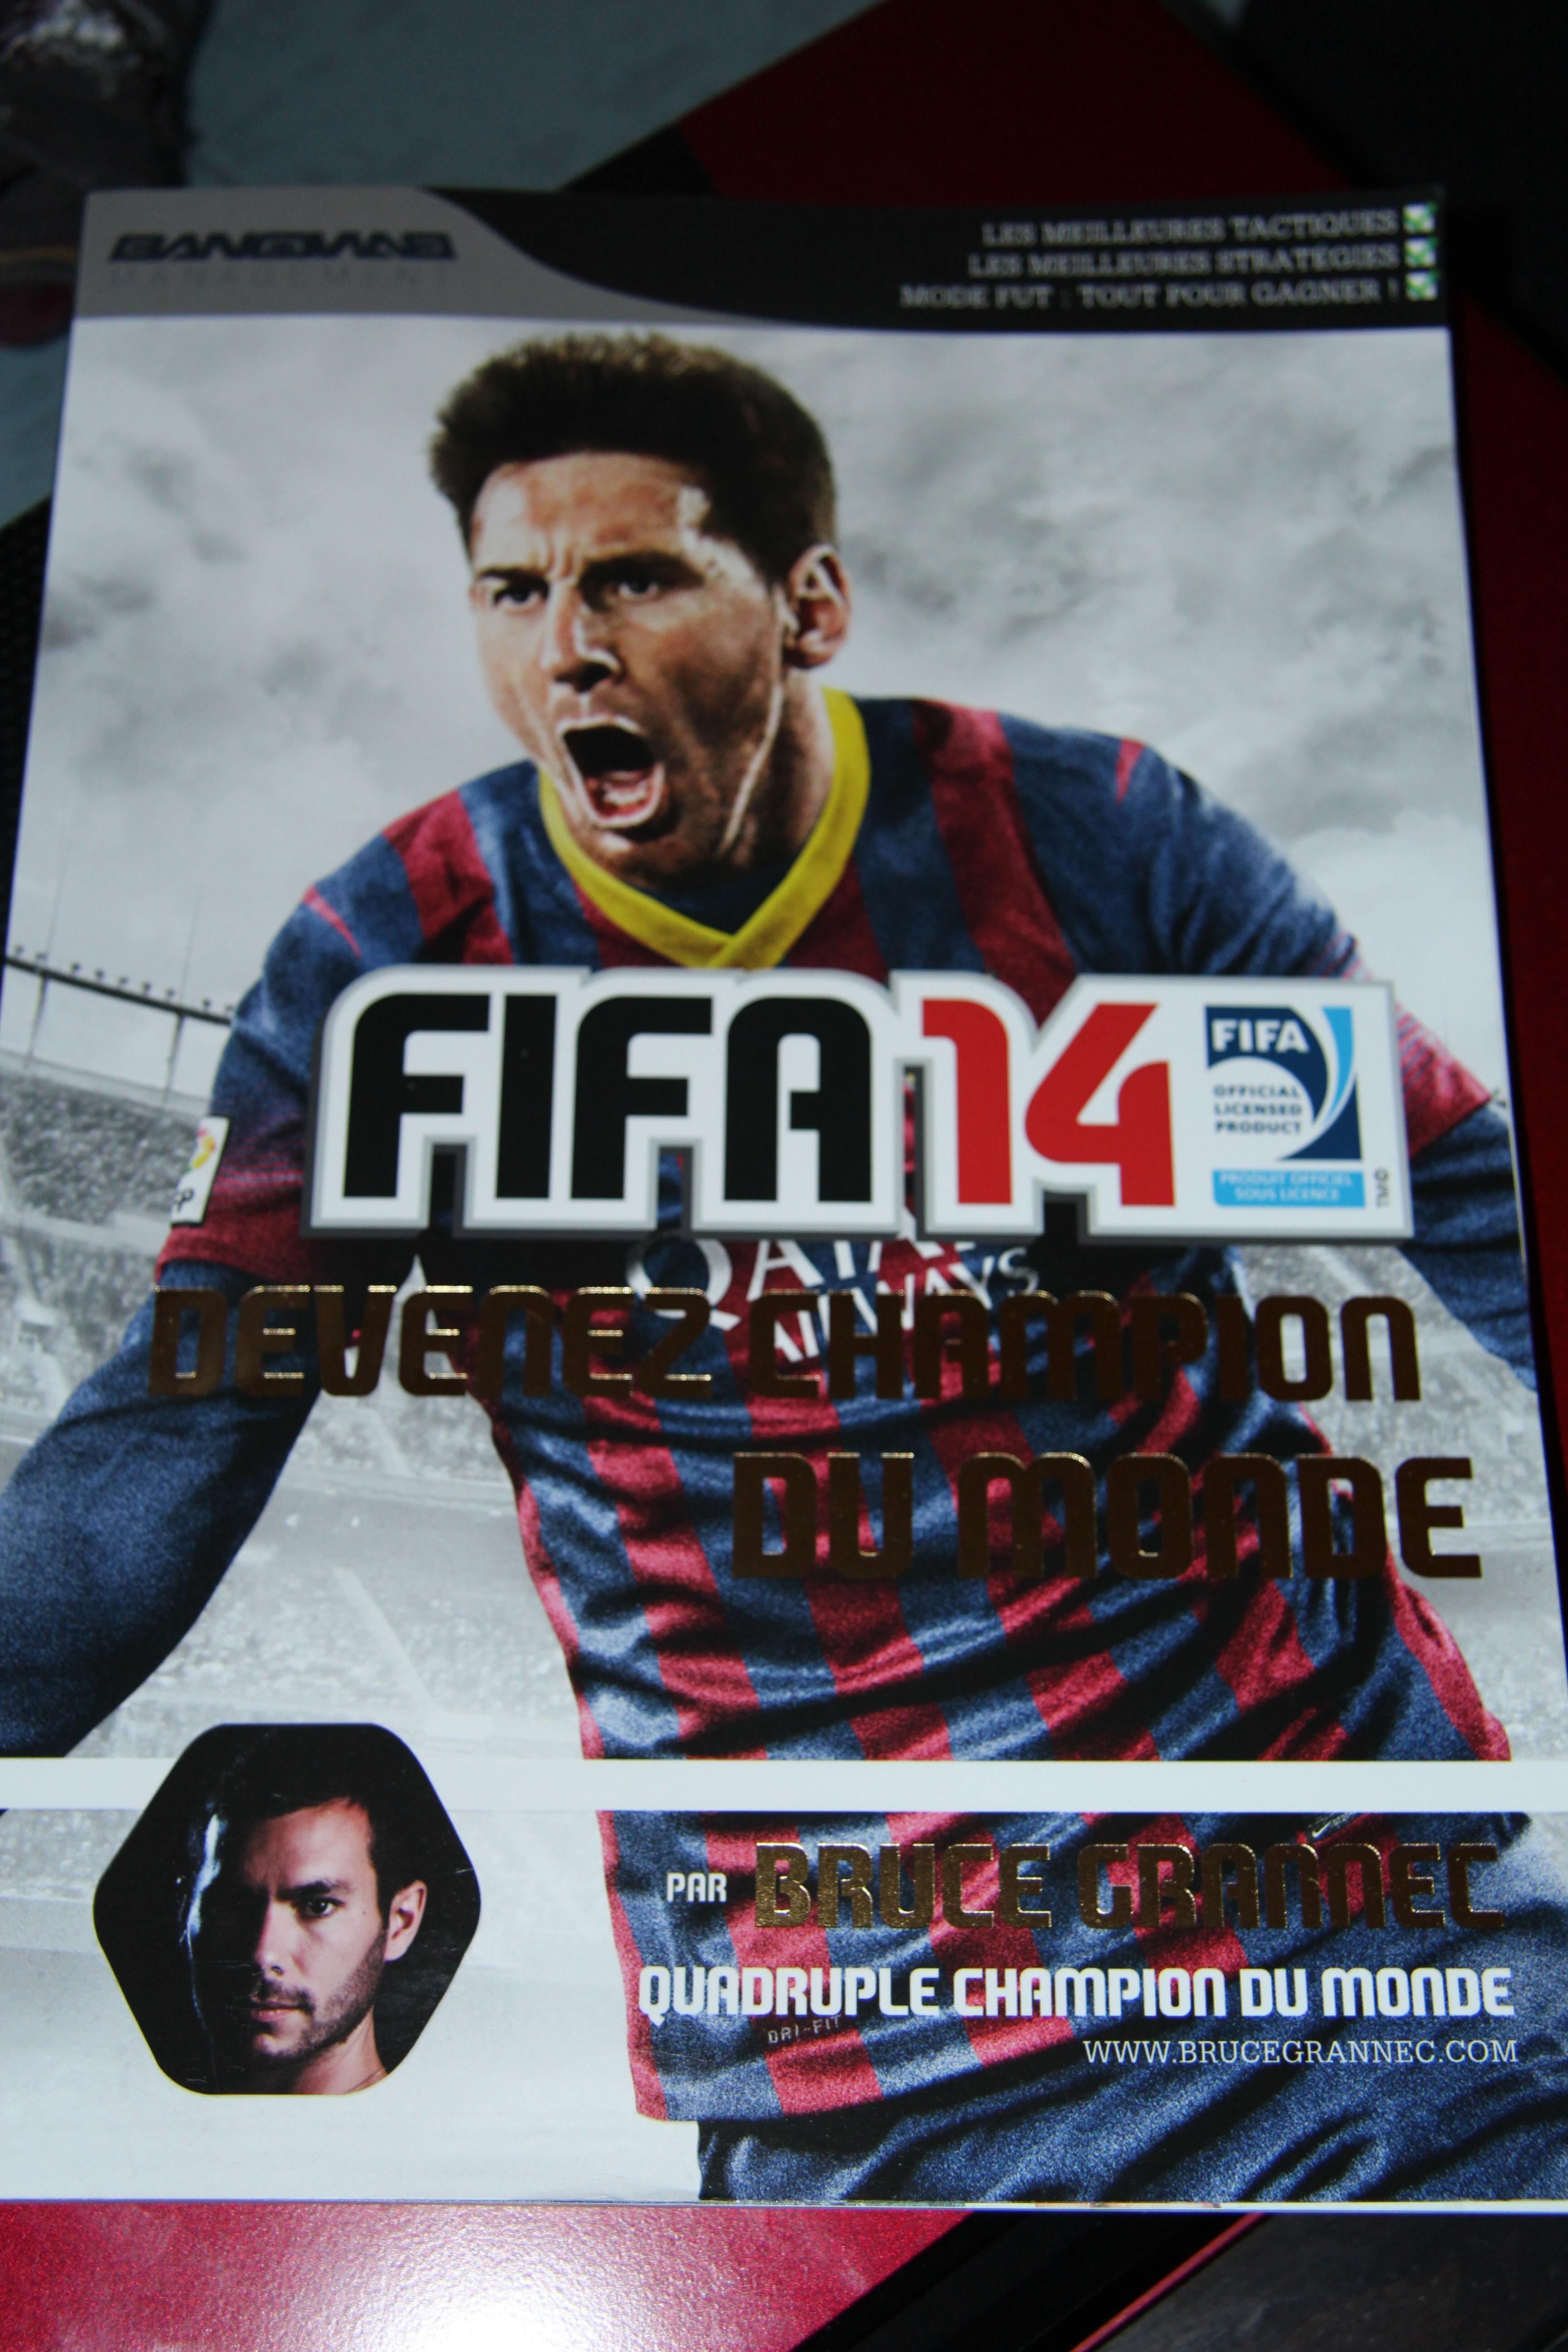 Devenez Champion Du Monde FIFA 14